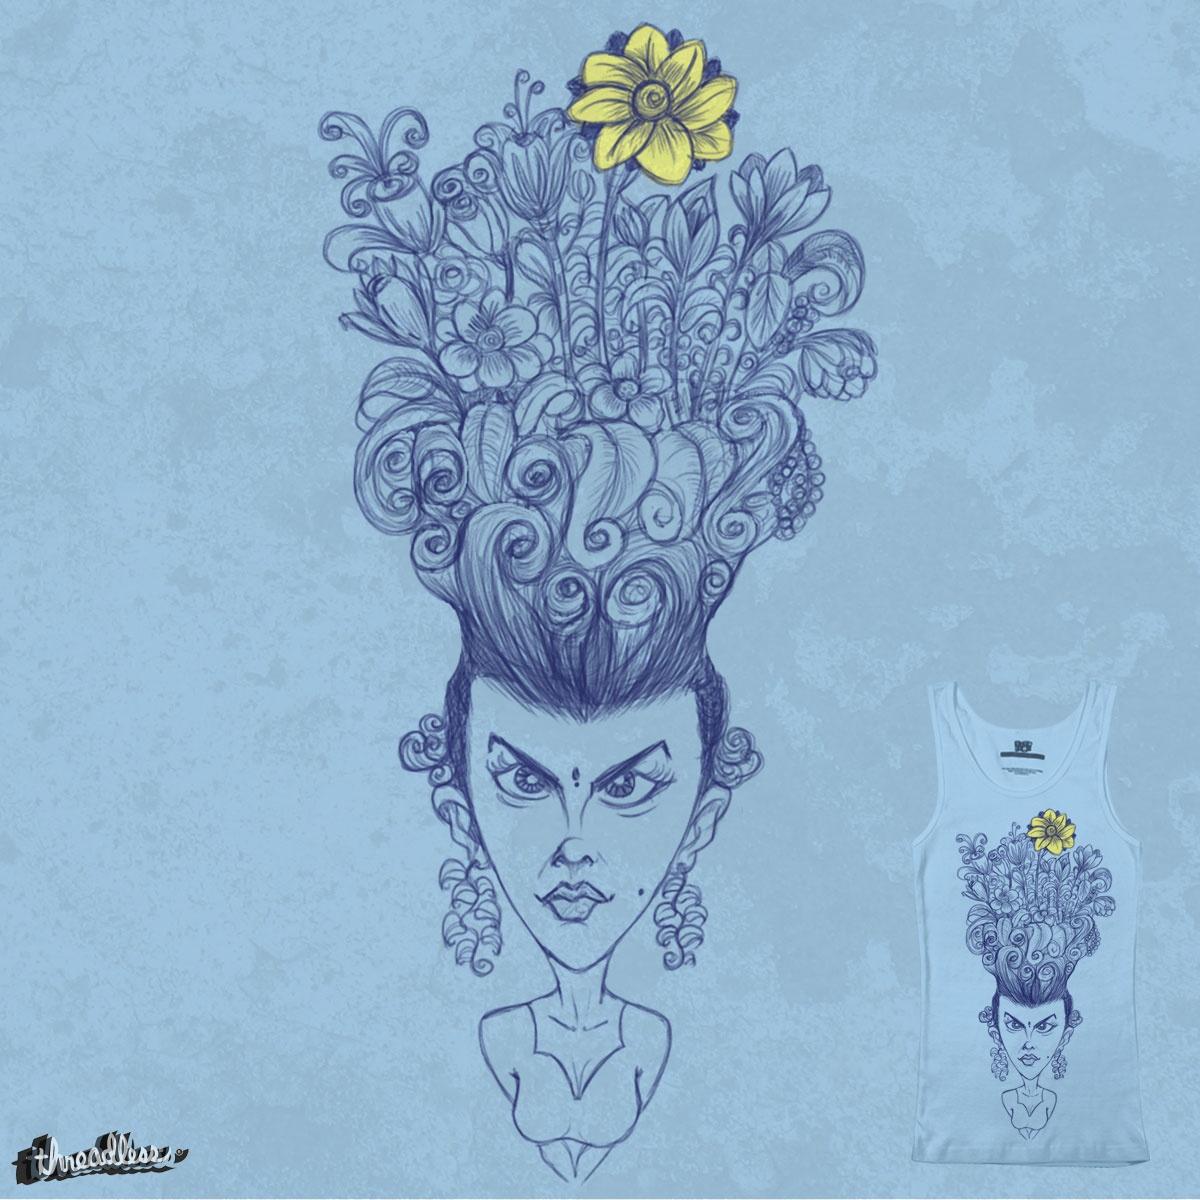 Flower Girl by DAmbati on Threadless